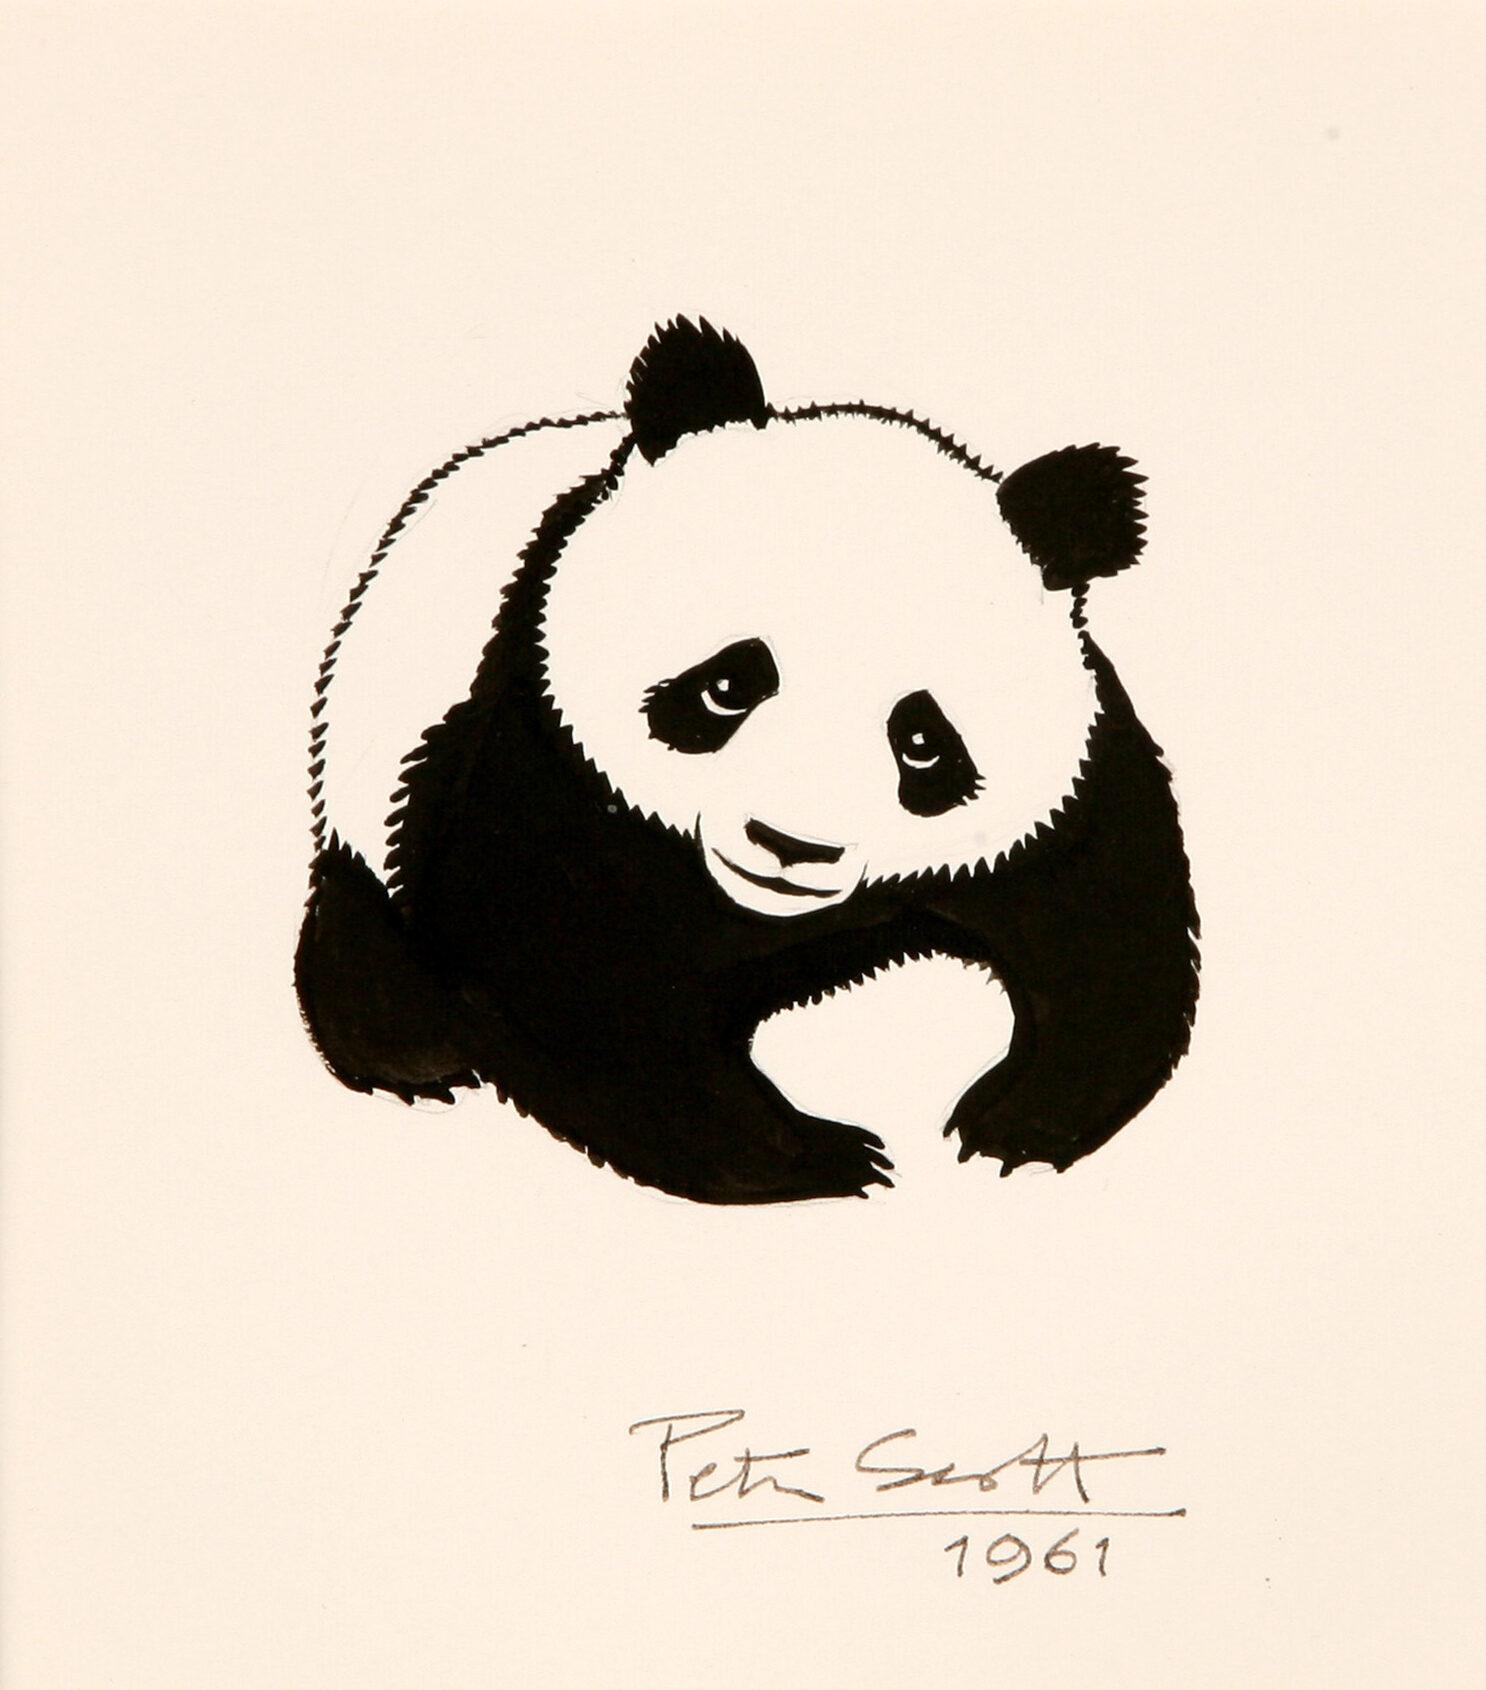 Giant Panda WWF Logo ink drawing by Sir Peter Scott  © Courtesy Dafila Scott